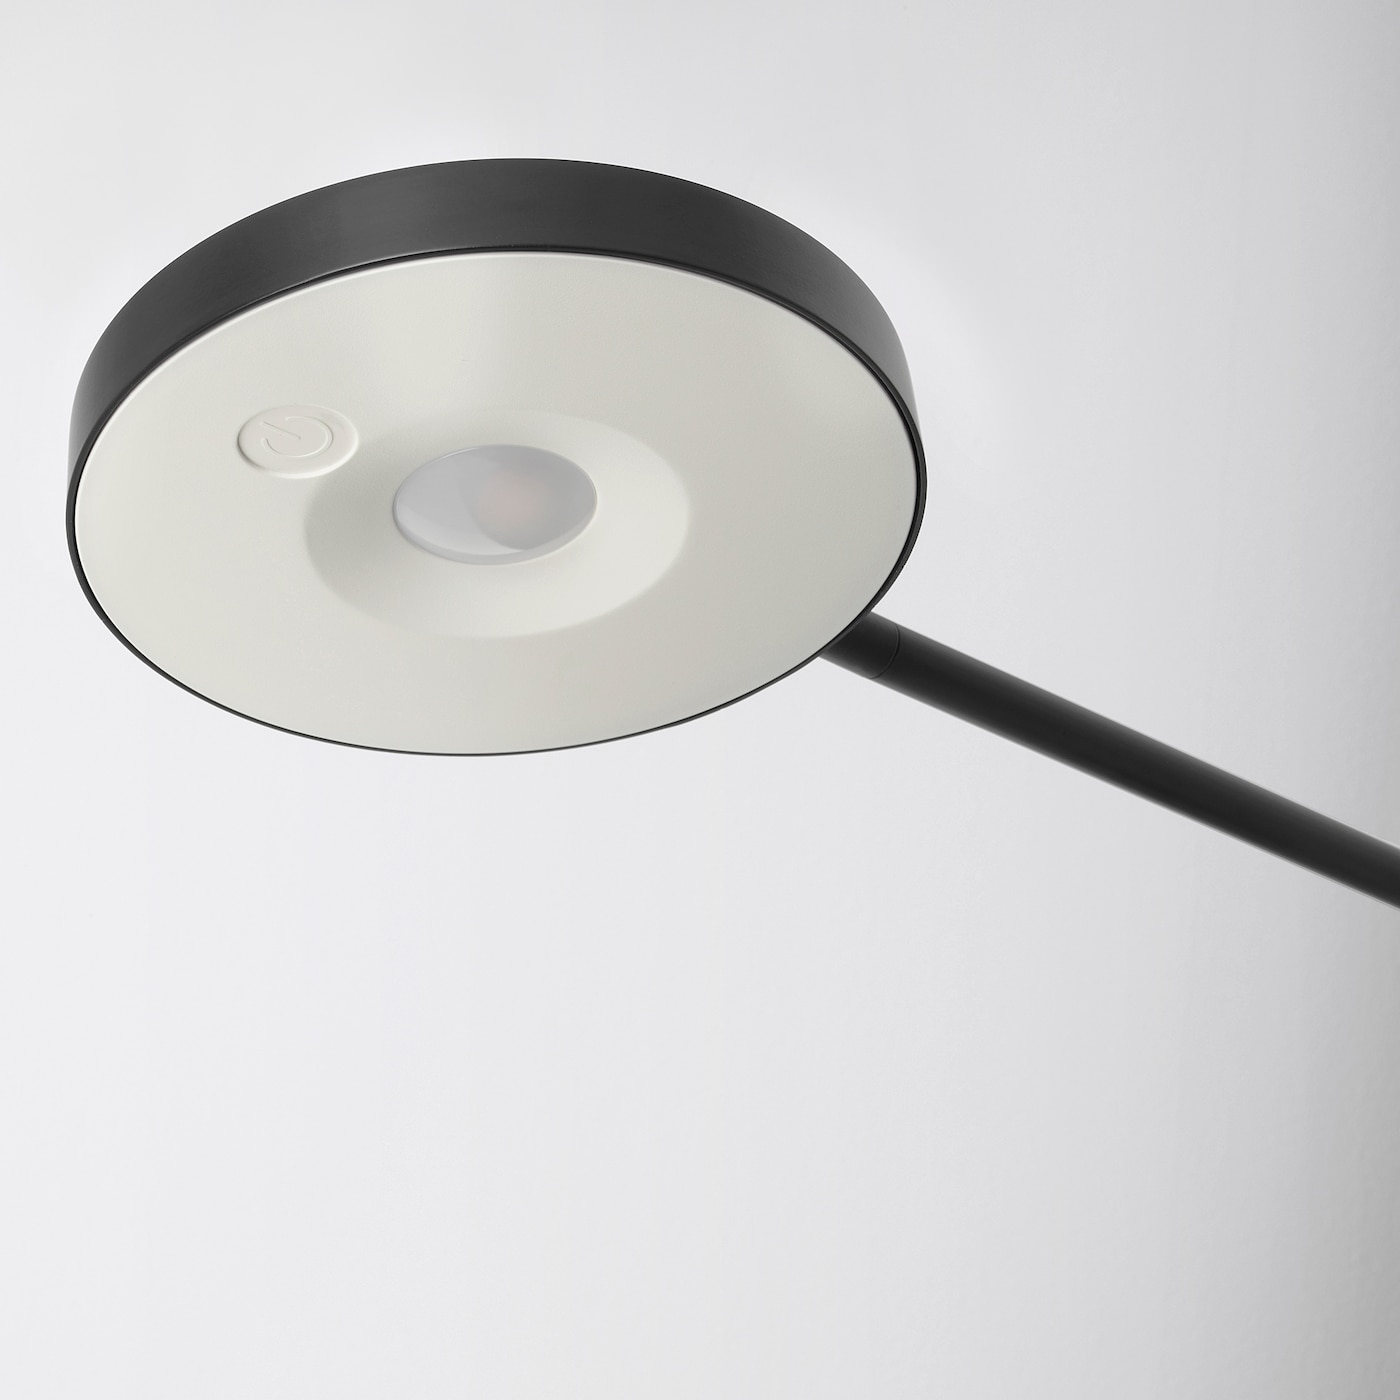 Ypperlig Led Floor Lamp Dark Grey Ikea Switzerland